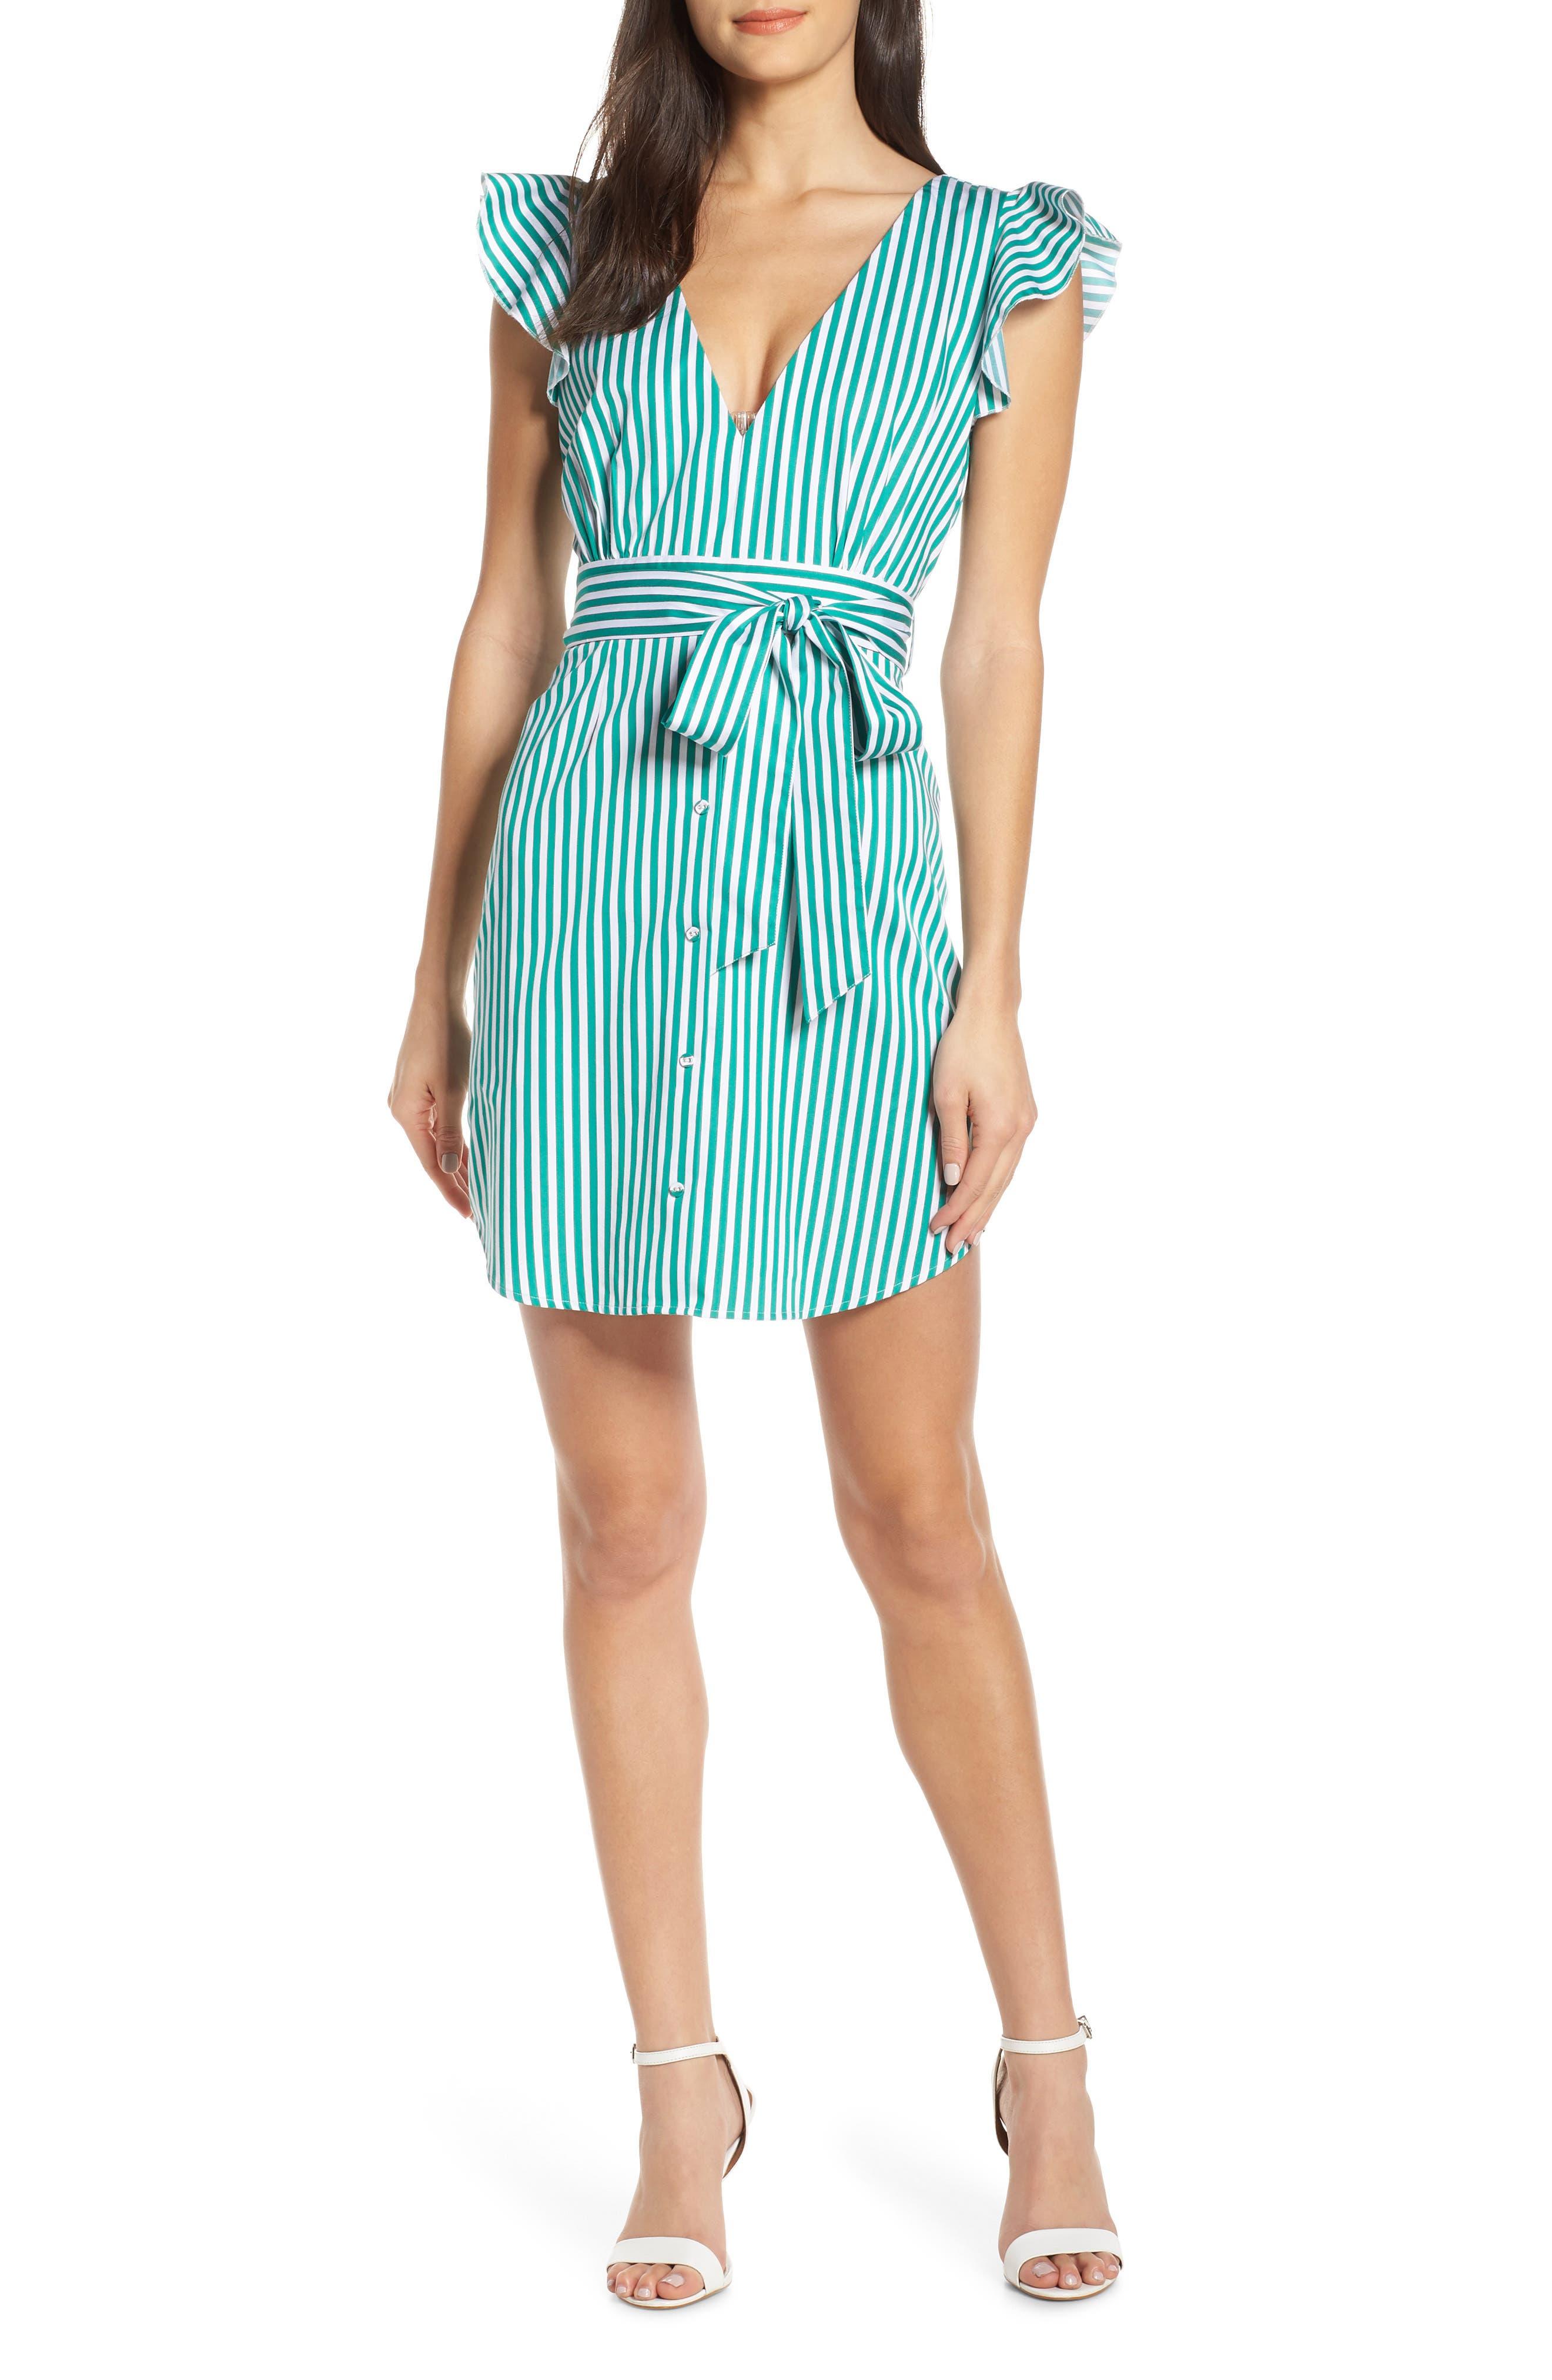 Bb Dakota Peppermint Stripe Dress, Green